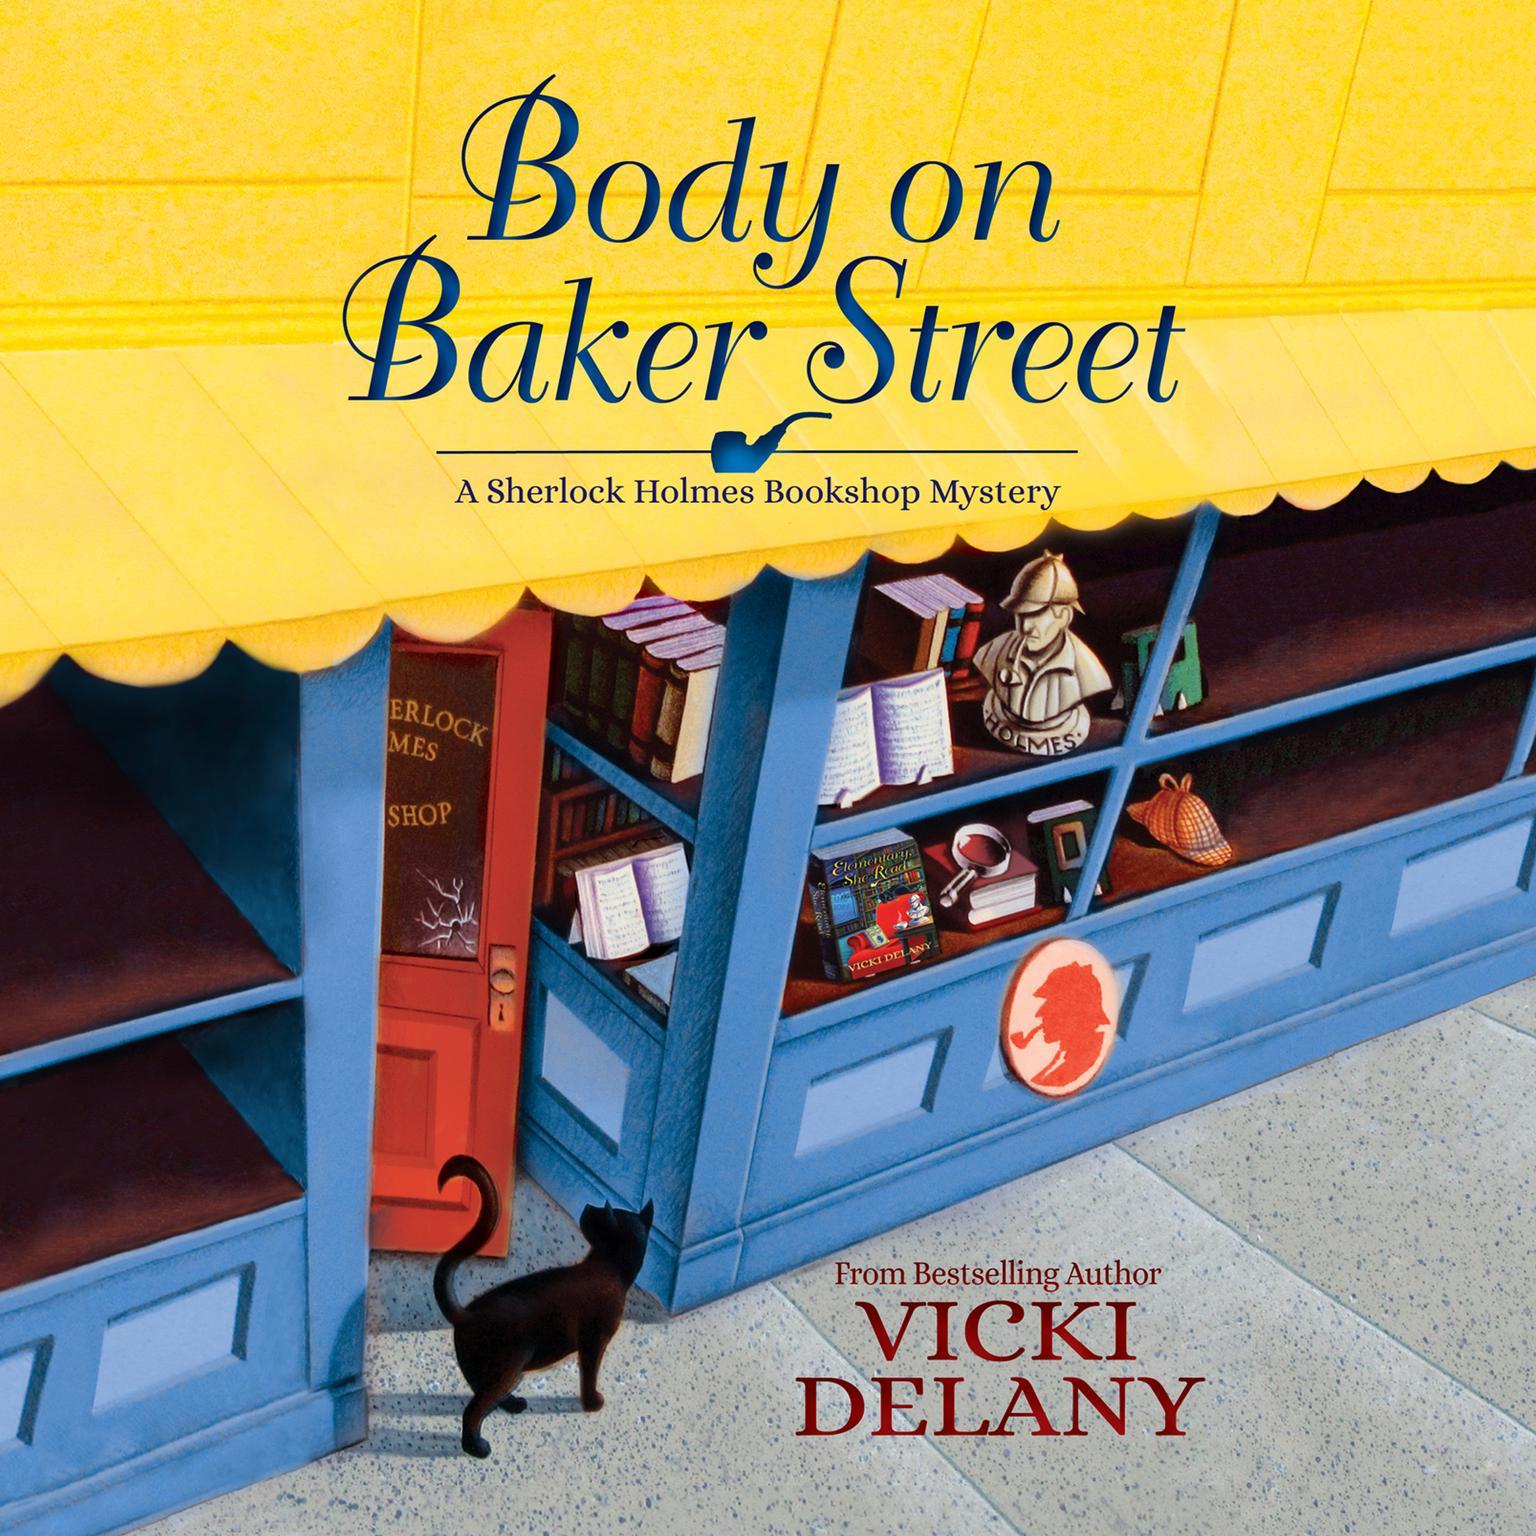 Body on Baker Street Audiobook, by Vicki Delany